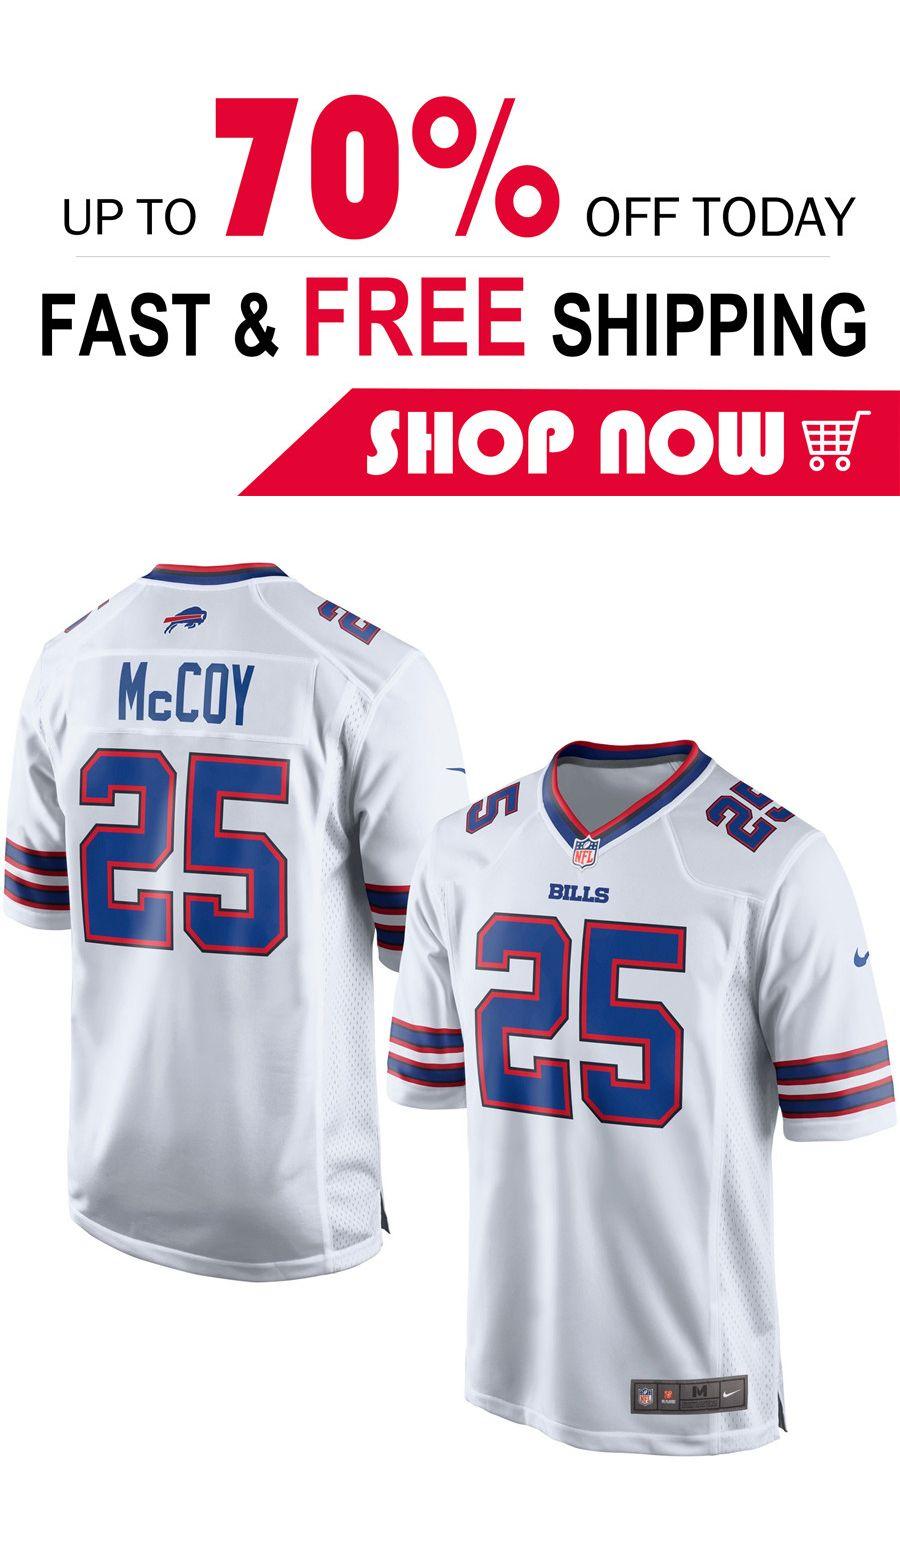 detailed look b09c2 4f970 LeSean McCoy Buffalo Bills football Game jersey | Buffalo ...